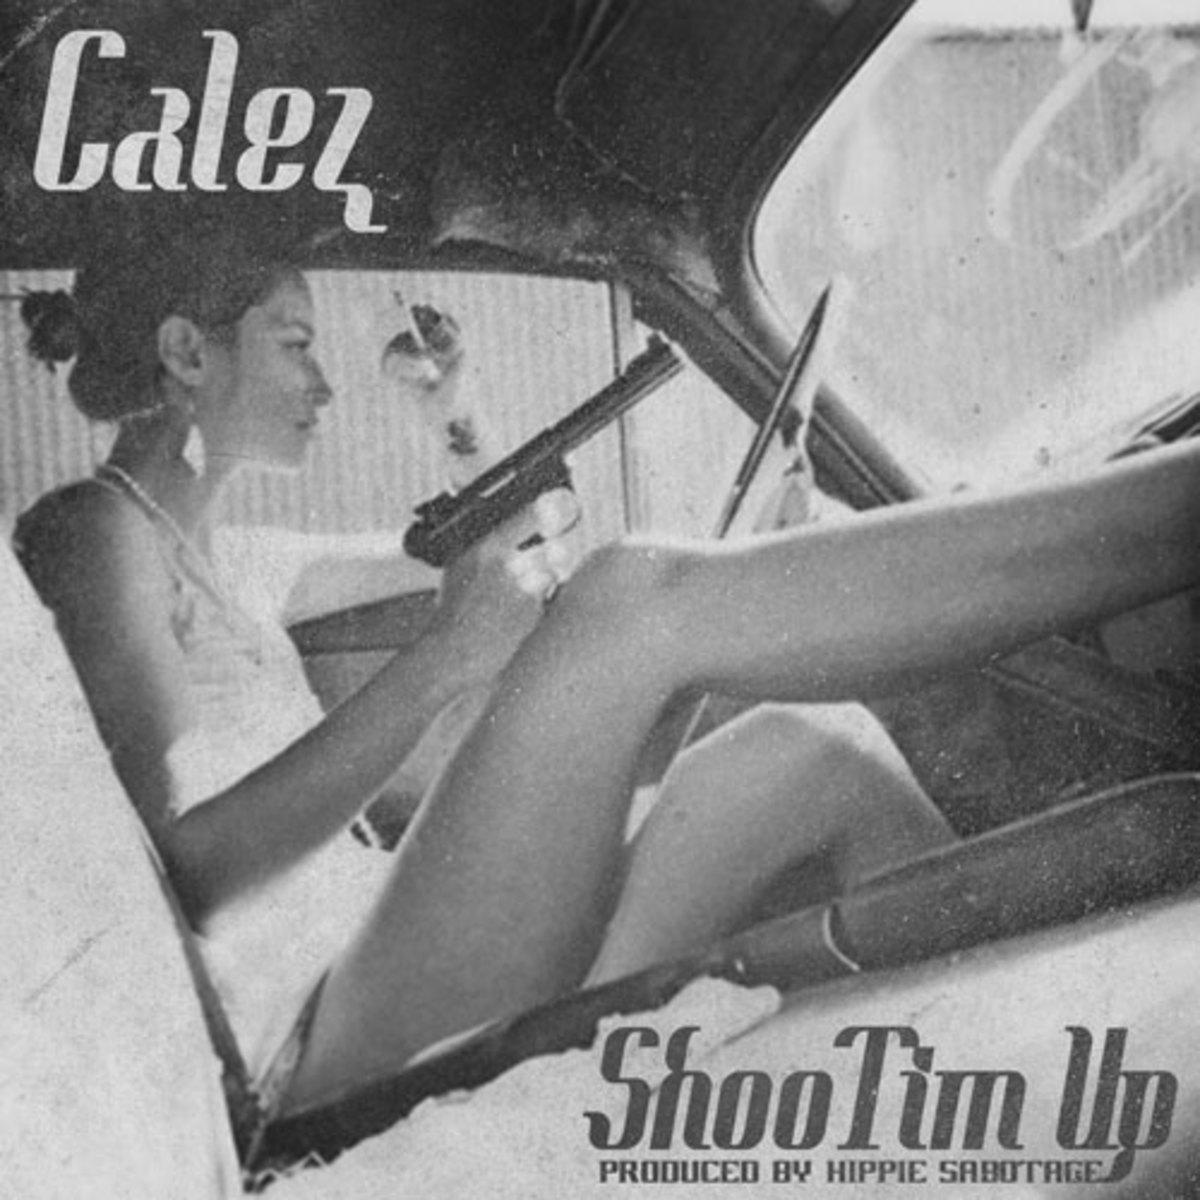 calez-shootimeup.jpg